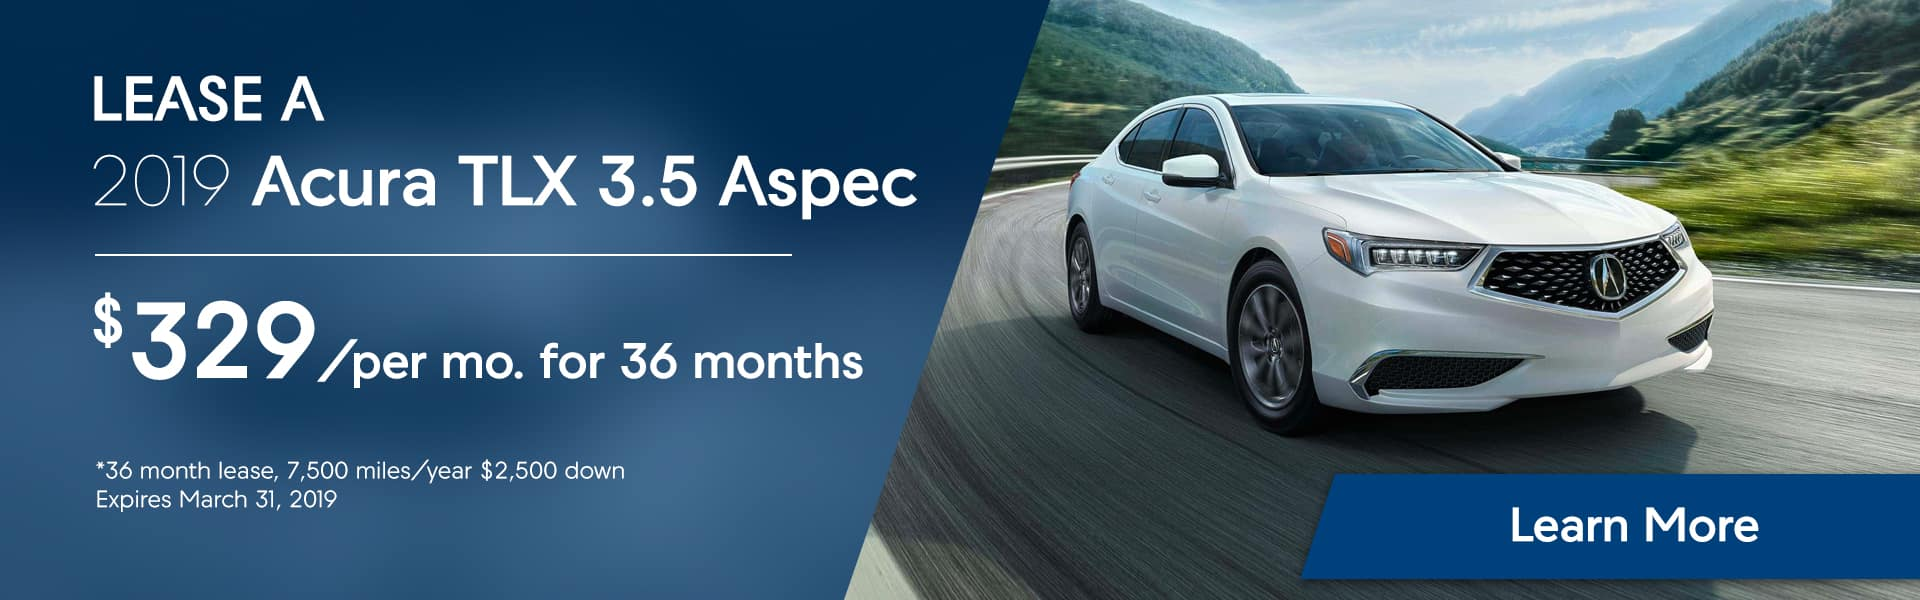 TLX 3.5 Aspec at Hubler Acura